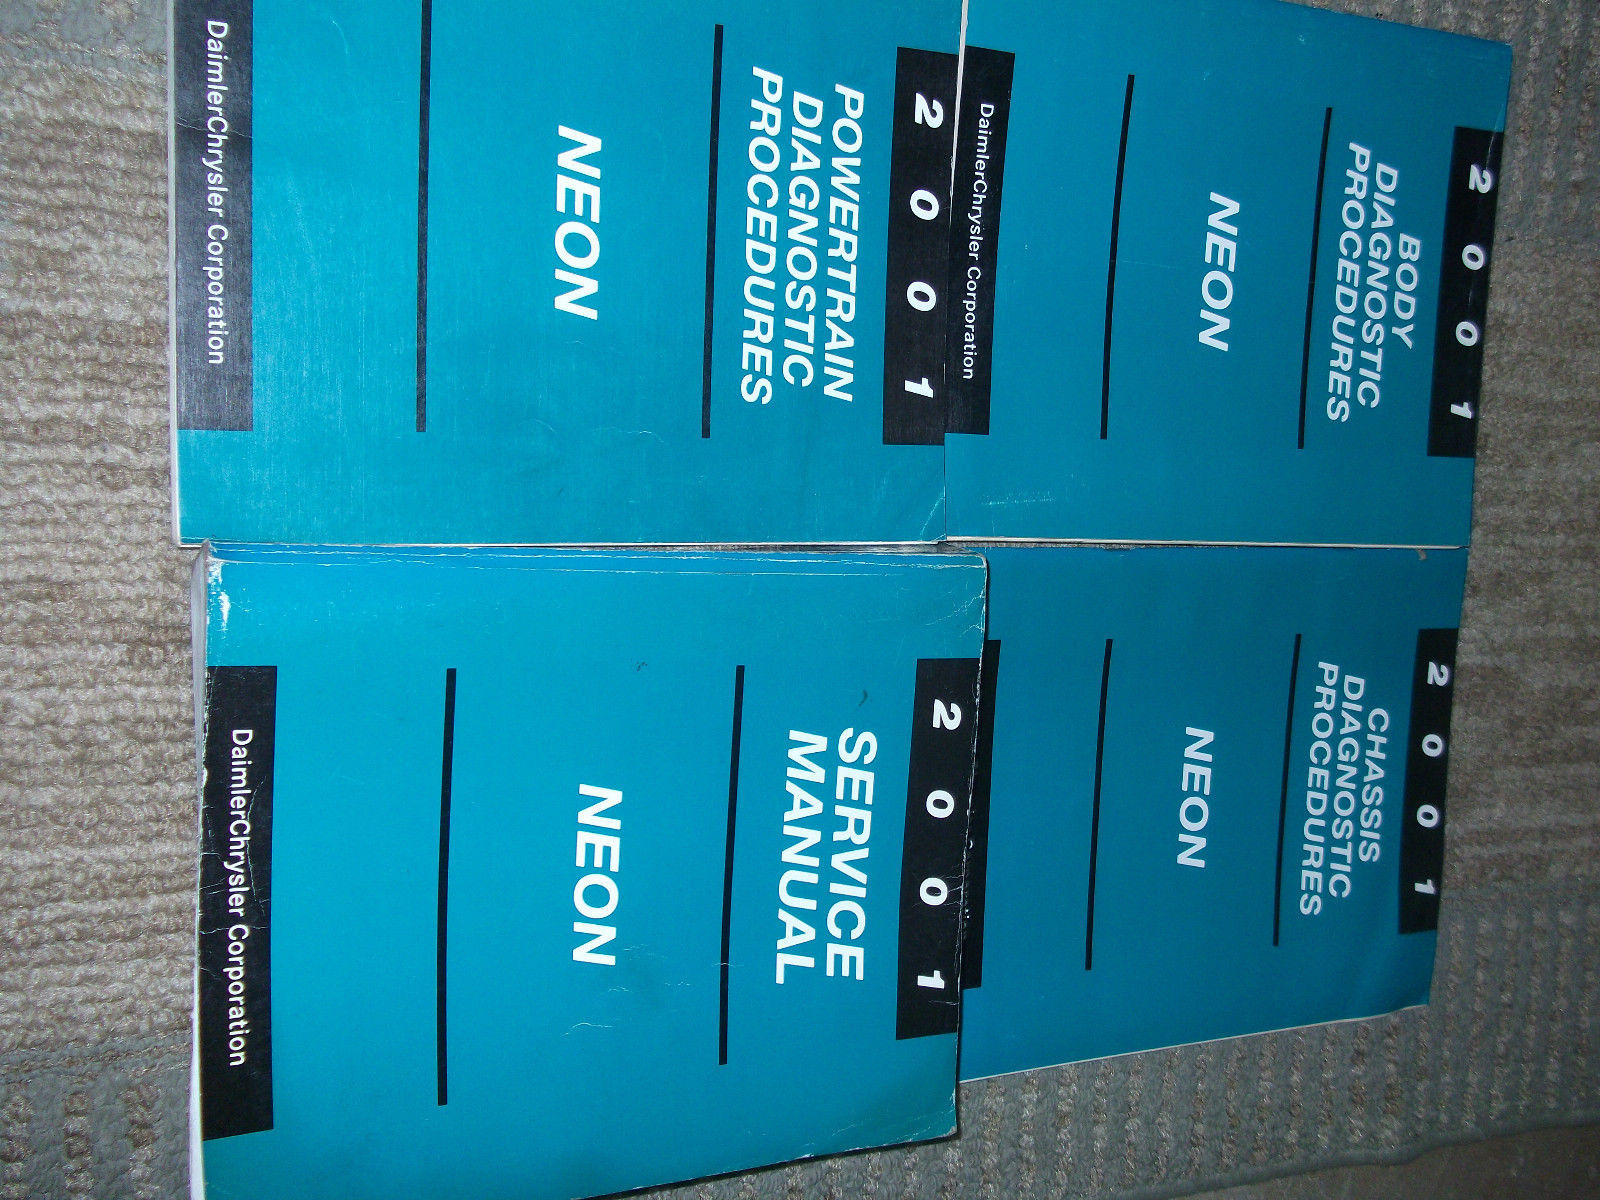 2001 Dodge Neon Shop Service Workshop Repair Manual Set W Diagnostics OEM